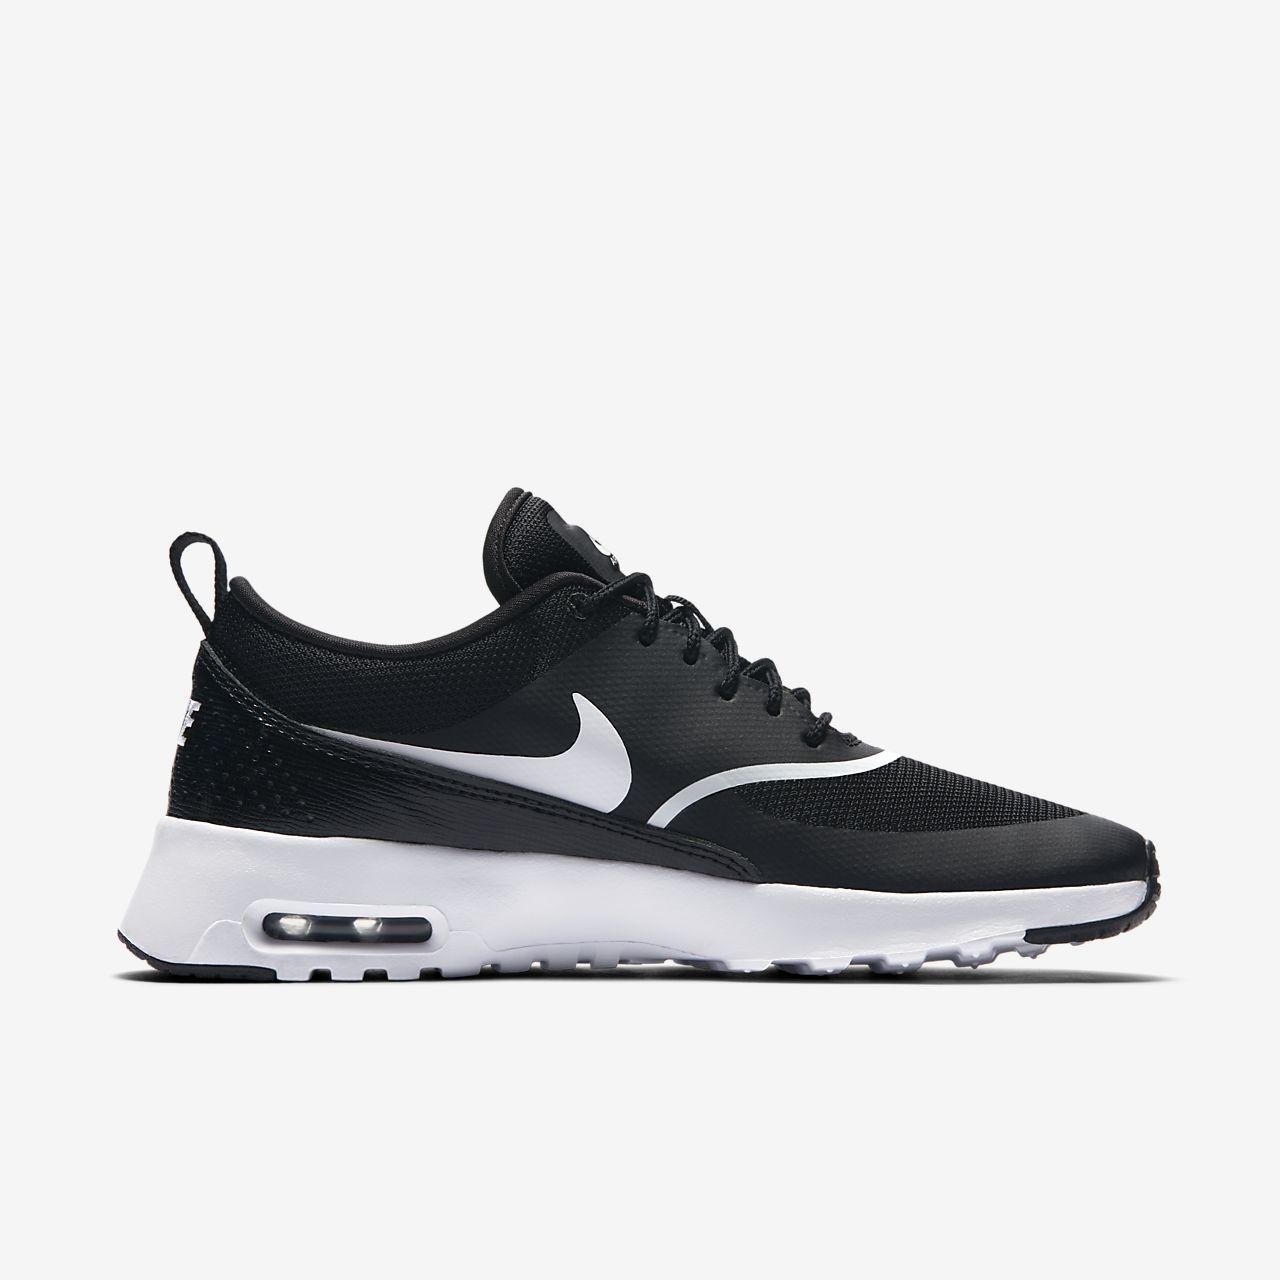 new style b3353 07683 nike air max thea Buty damskie Nike Air Max Thea. PL